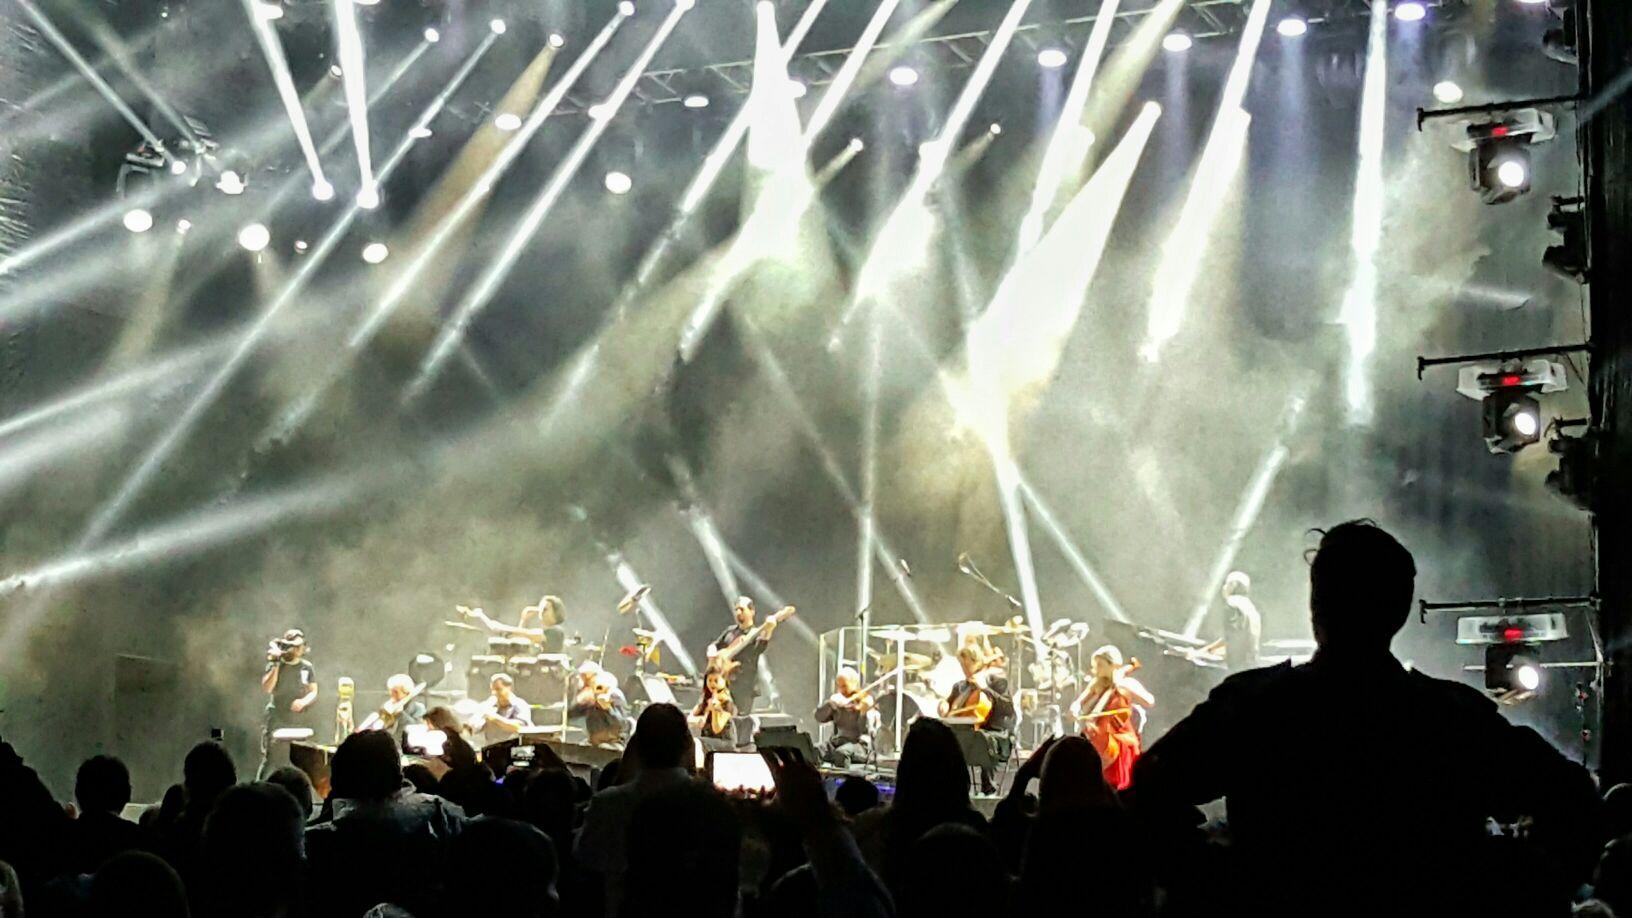 Un espectáculo de primer mundo! #Yanni #YanniCR w/ @katmarce https://t.co/lRXoOQEQsI